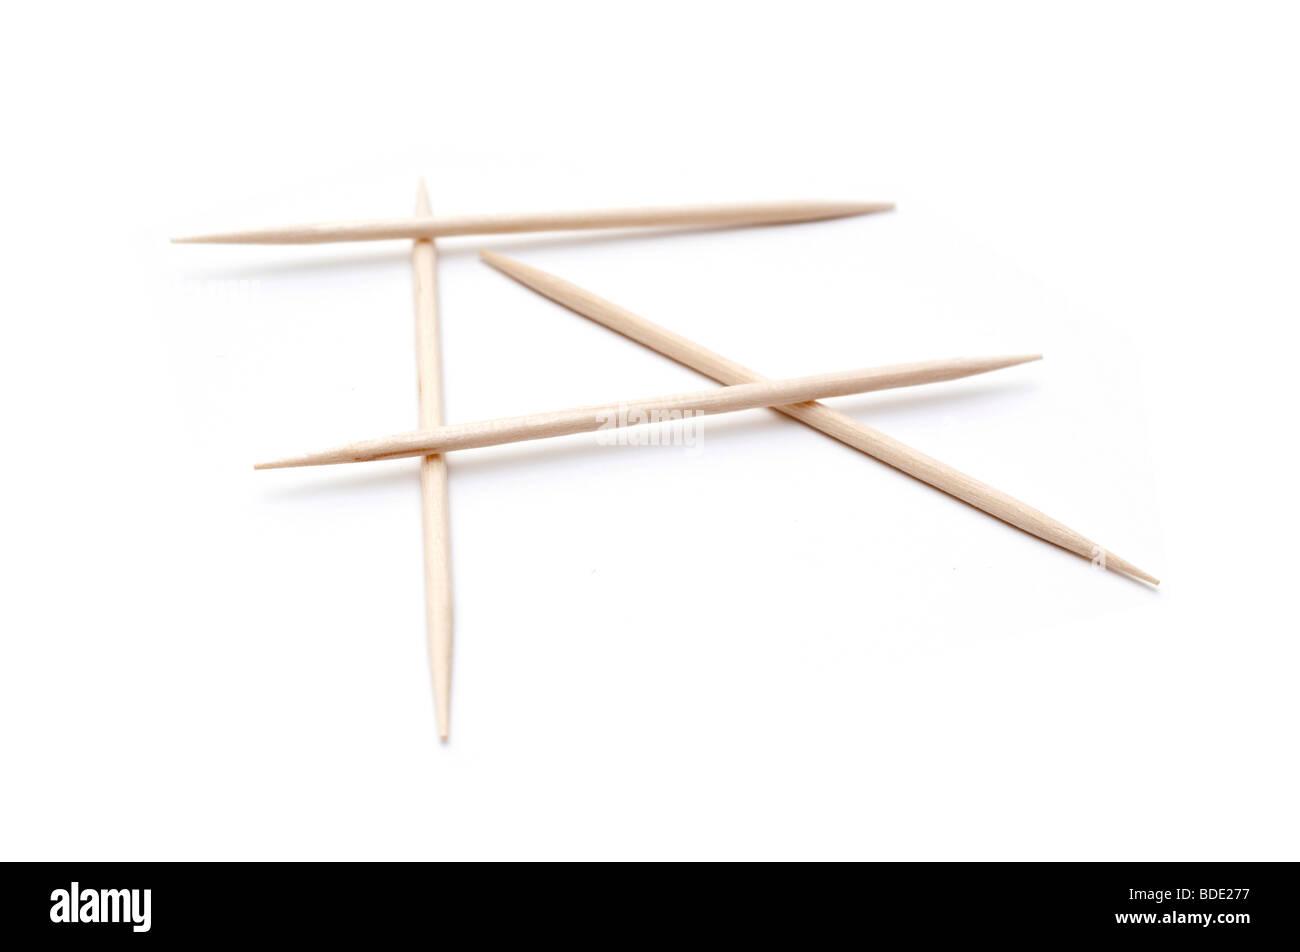 Few toothpicks on white background - Stock Image